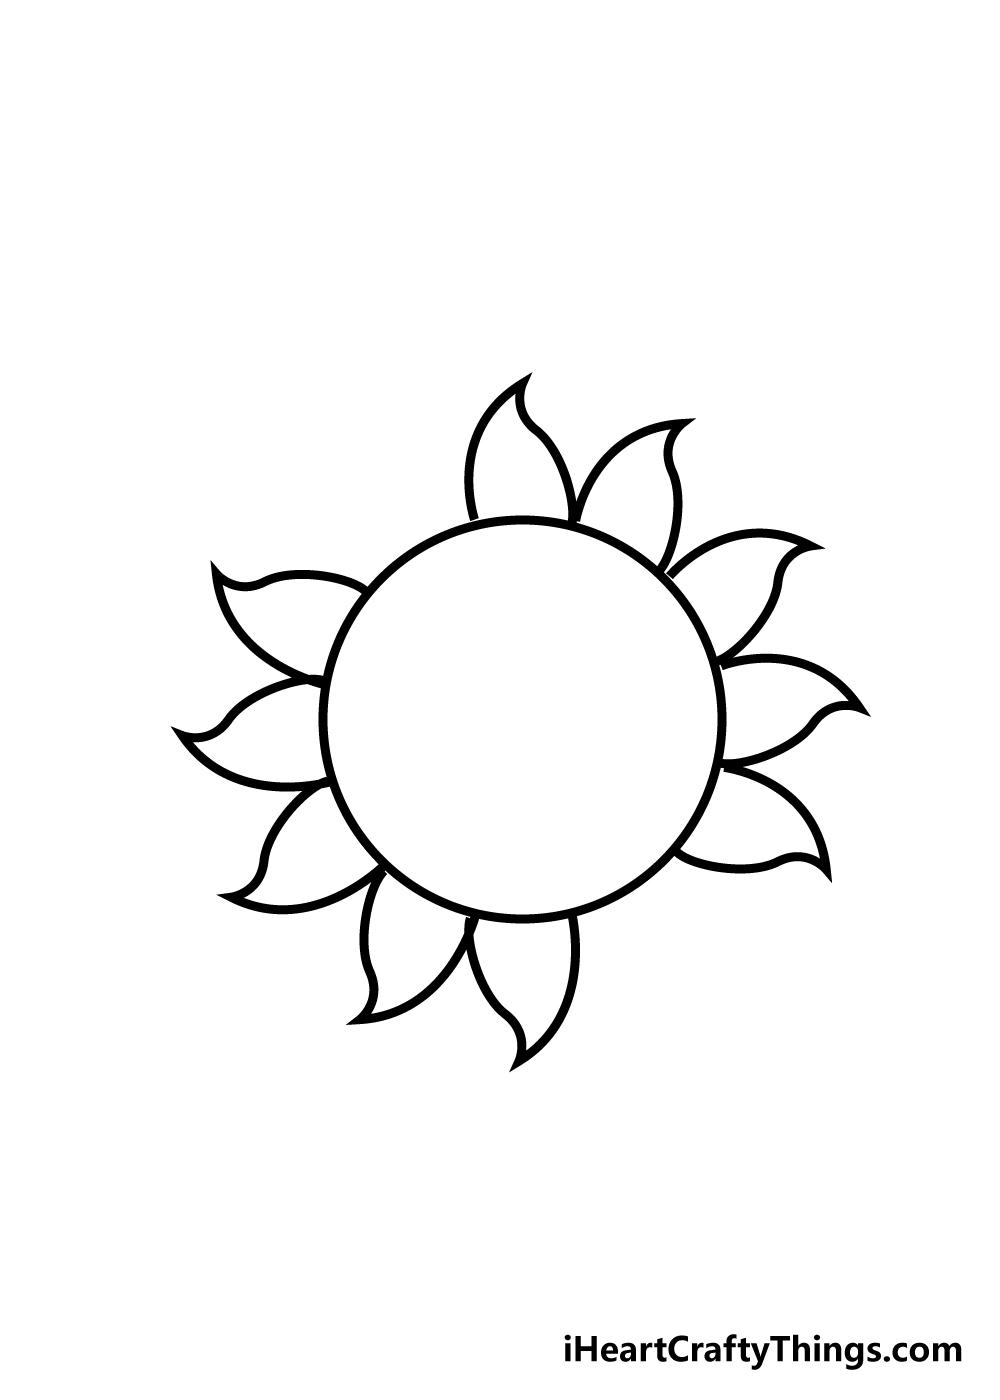 sun drawing step 5